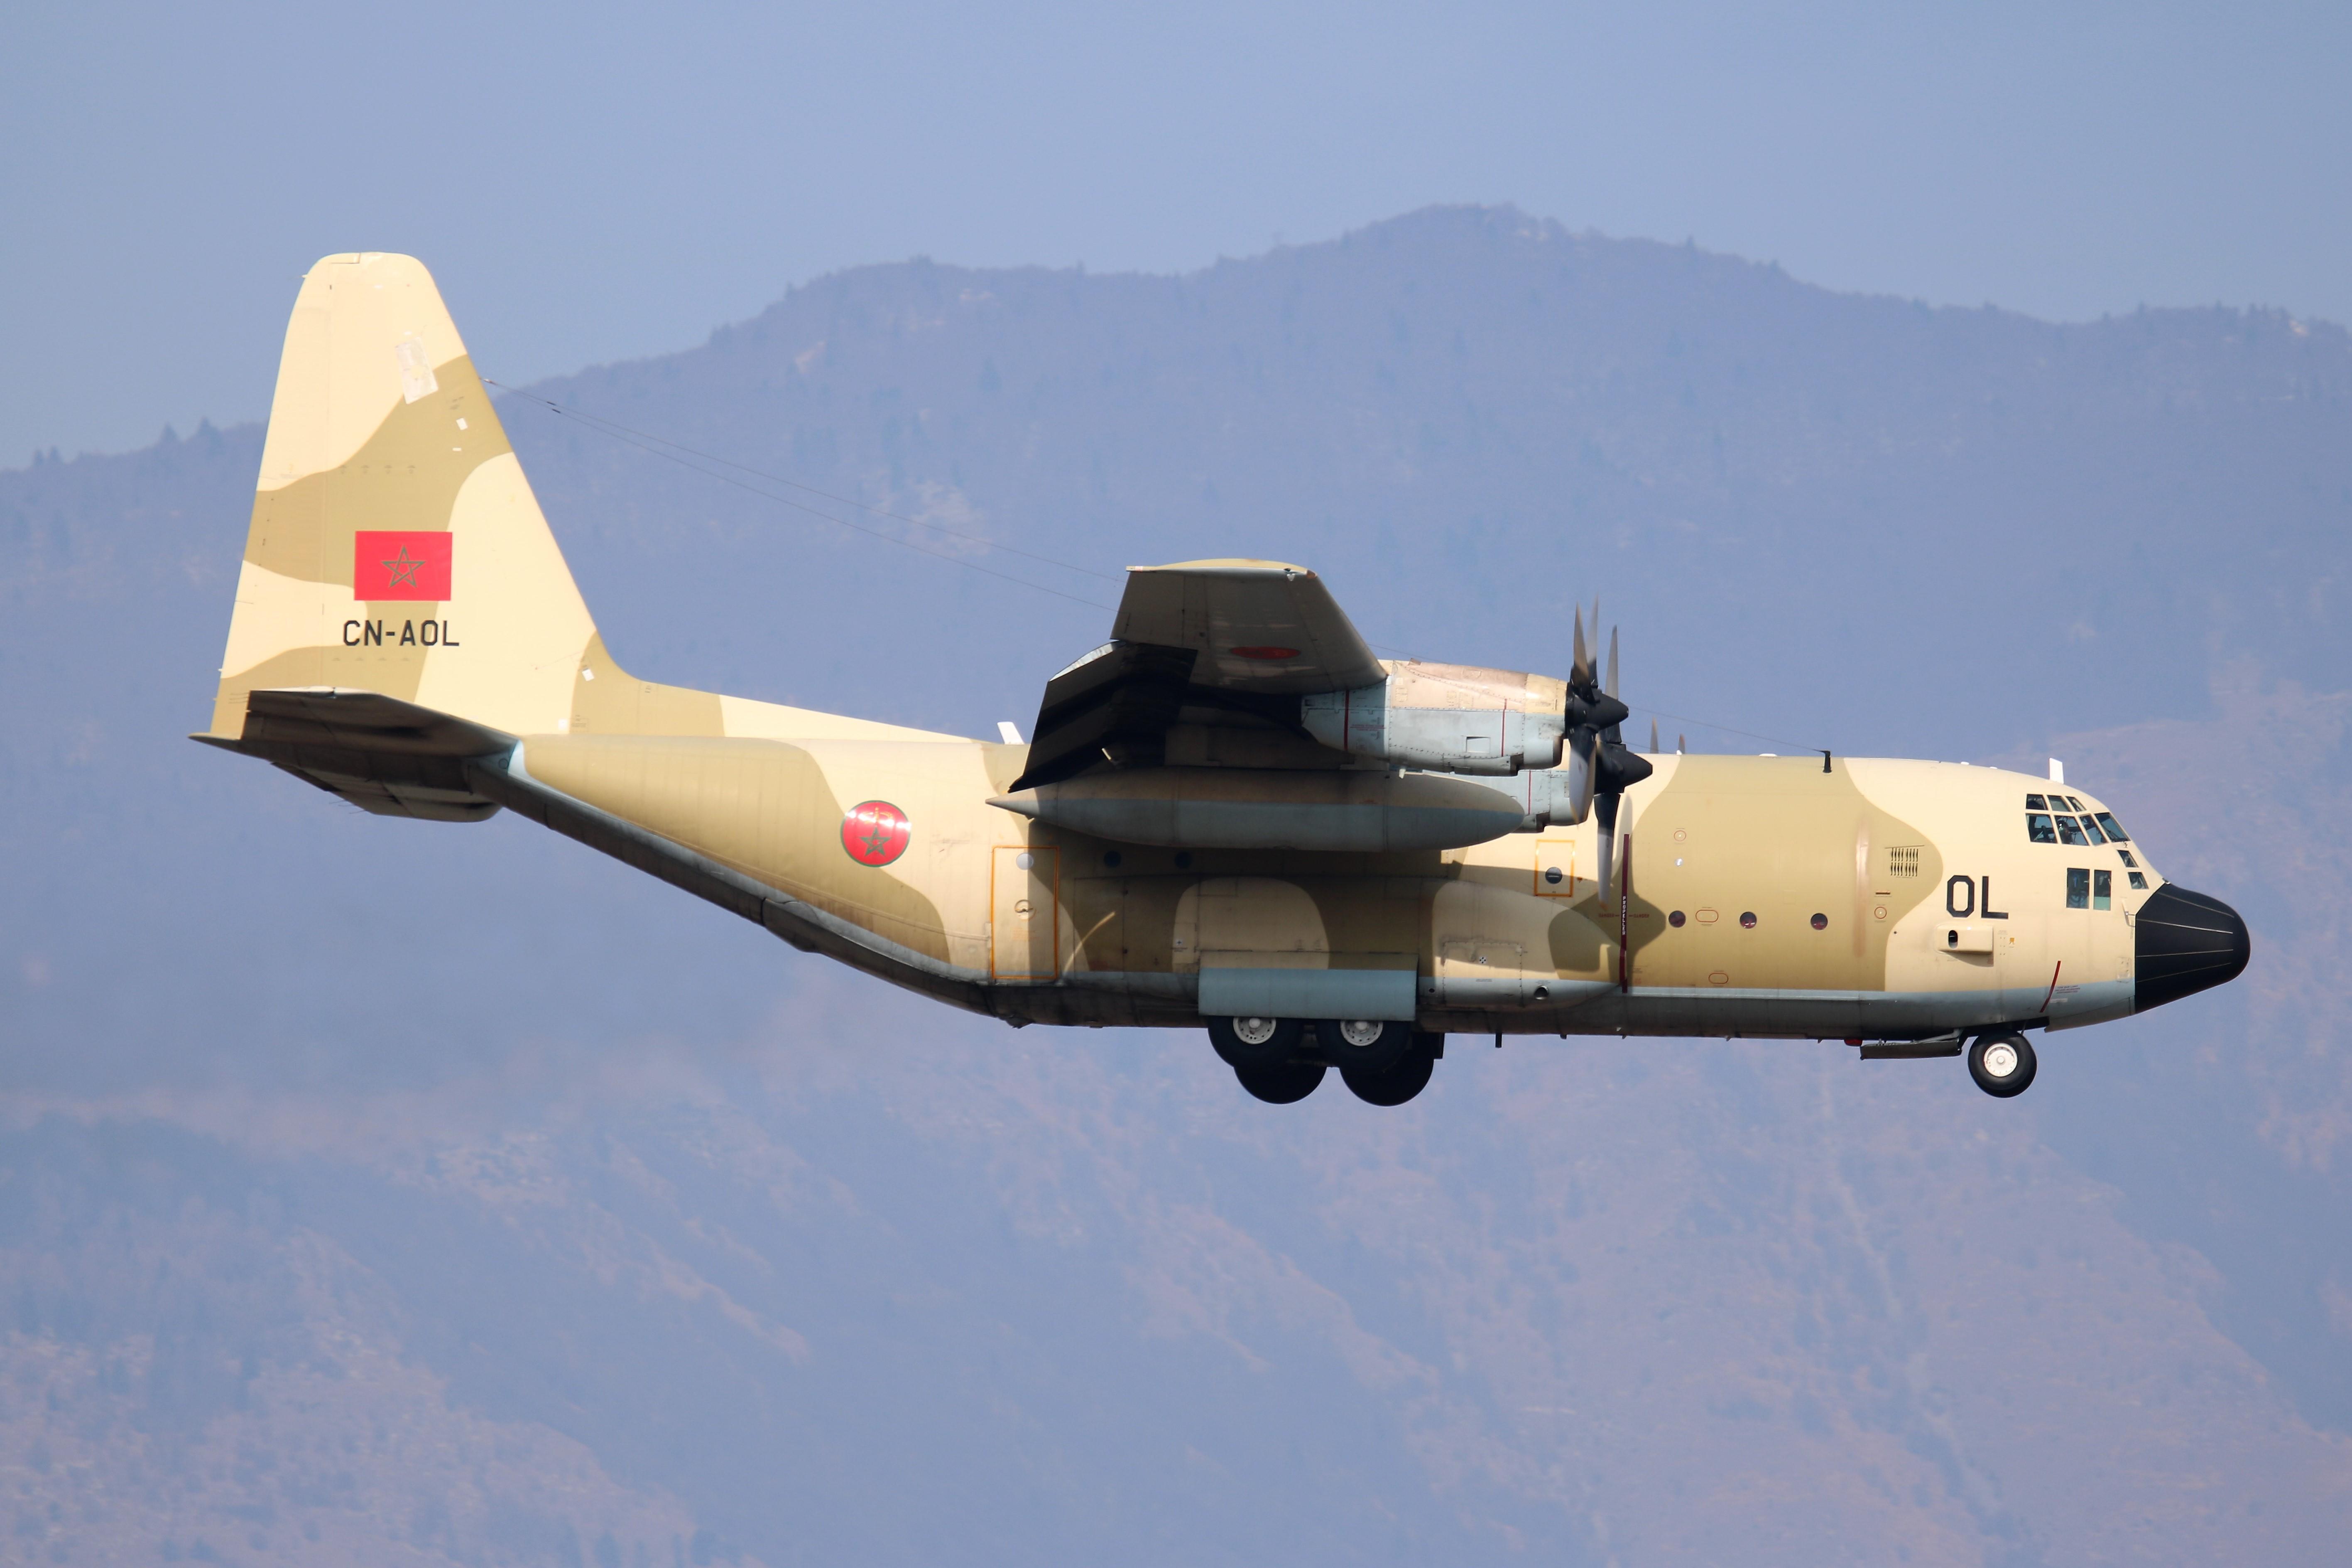 FRA: Photos d'avions de transport - Page 37 47392970511_596c437ebe_o